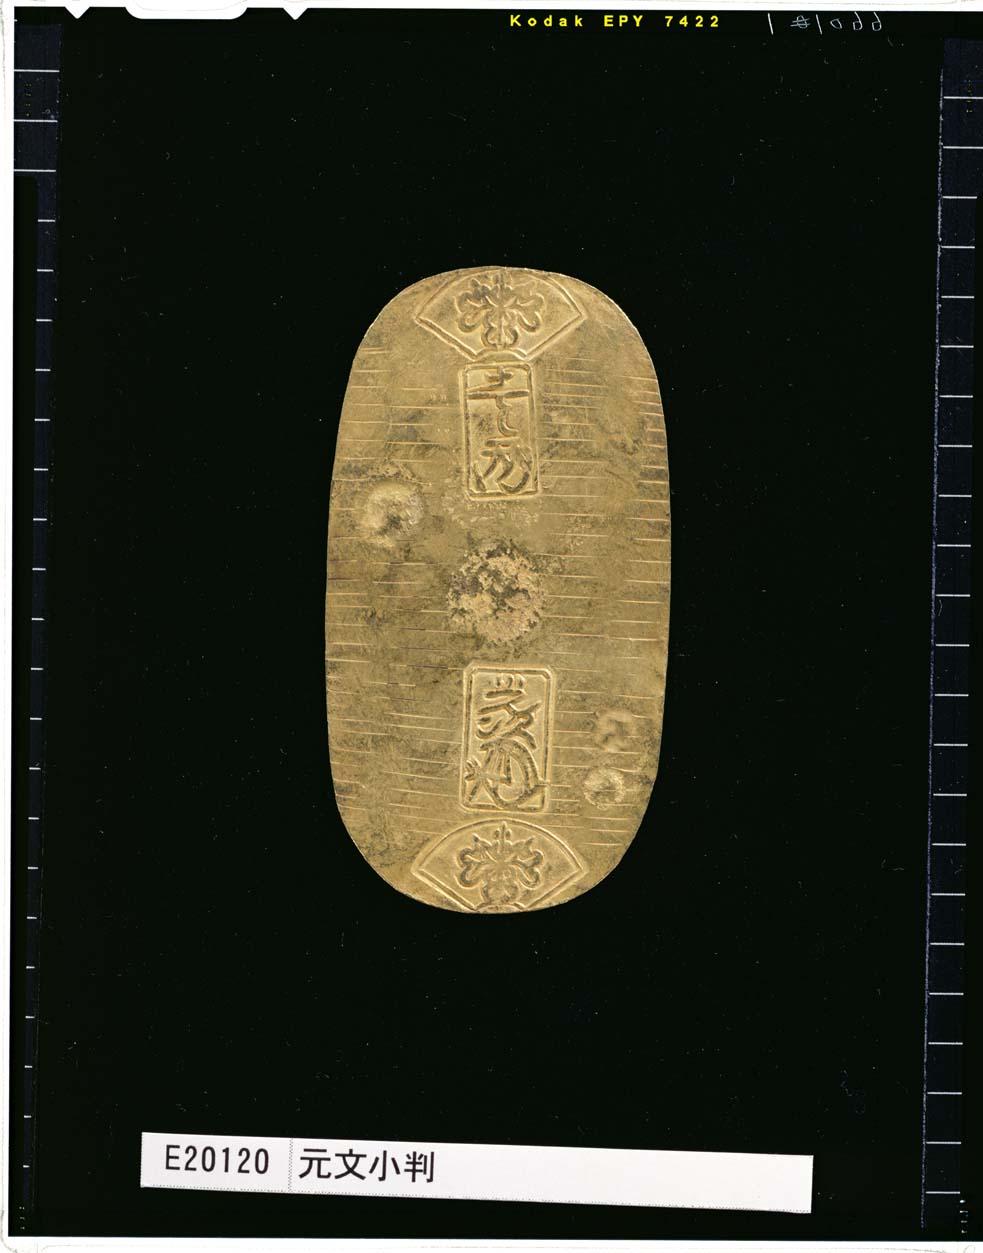 C0066011 元文小判 - 東京国立博物館 画像検索